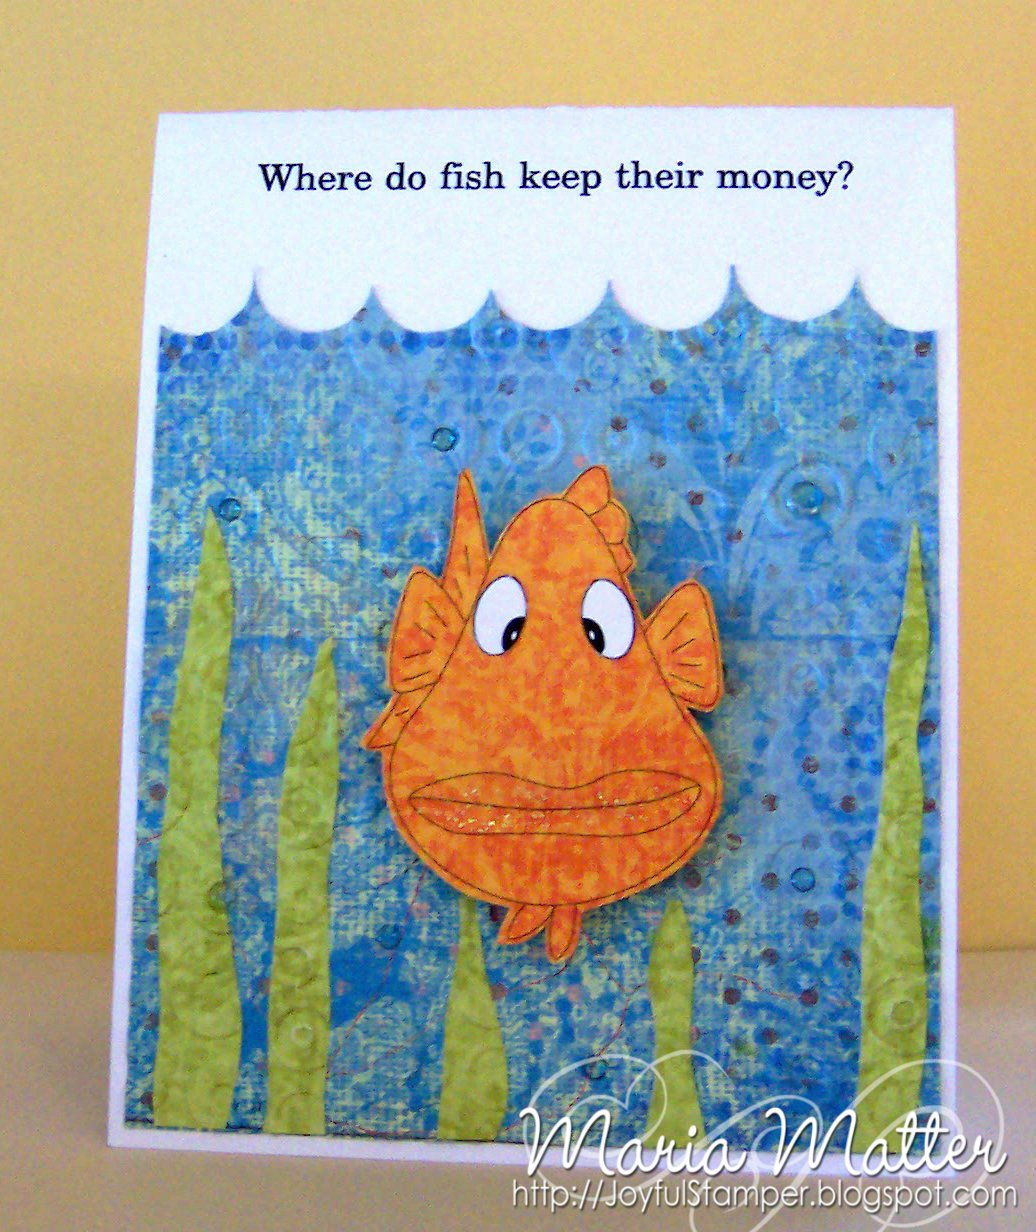 joyful stamper 3 31 where do fish keep their money